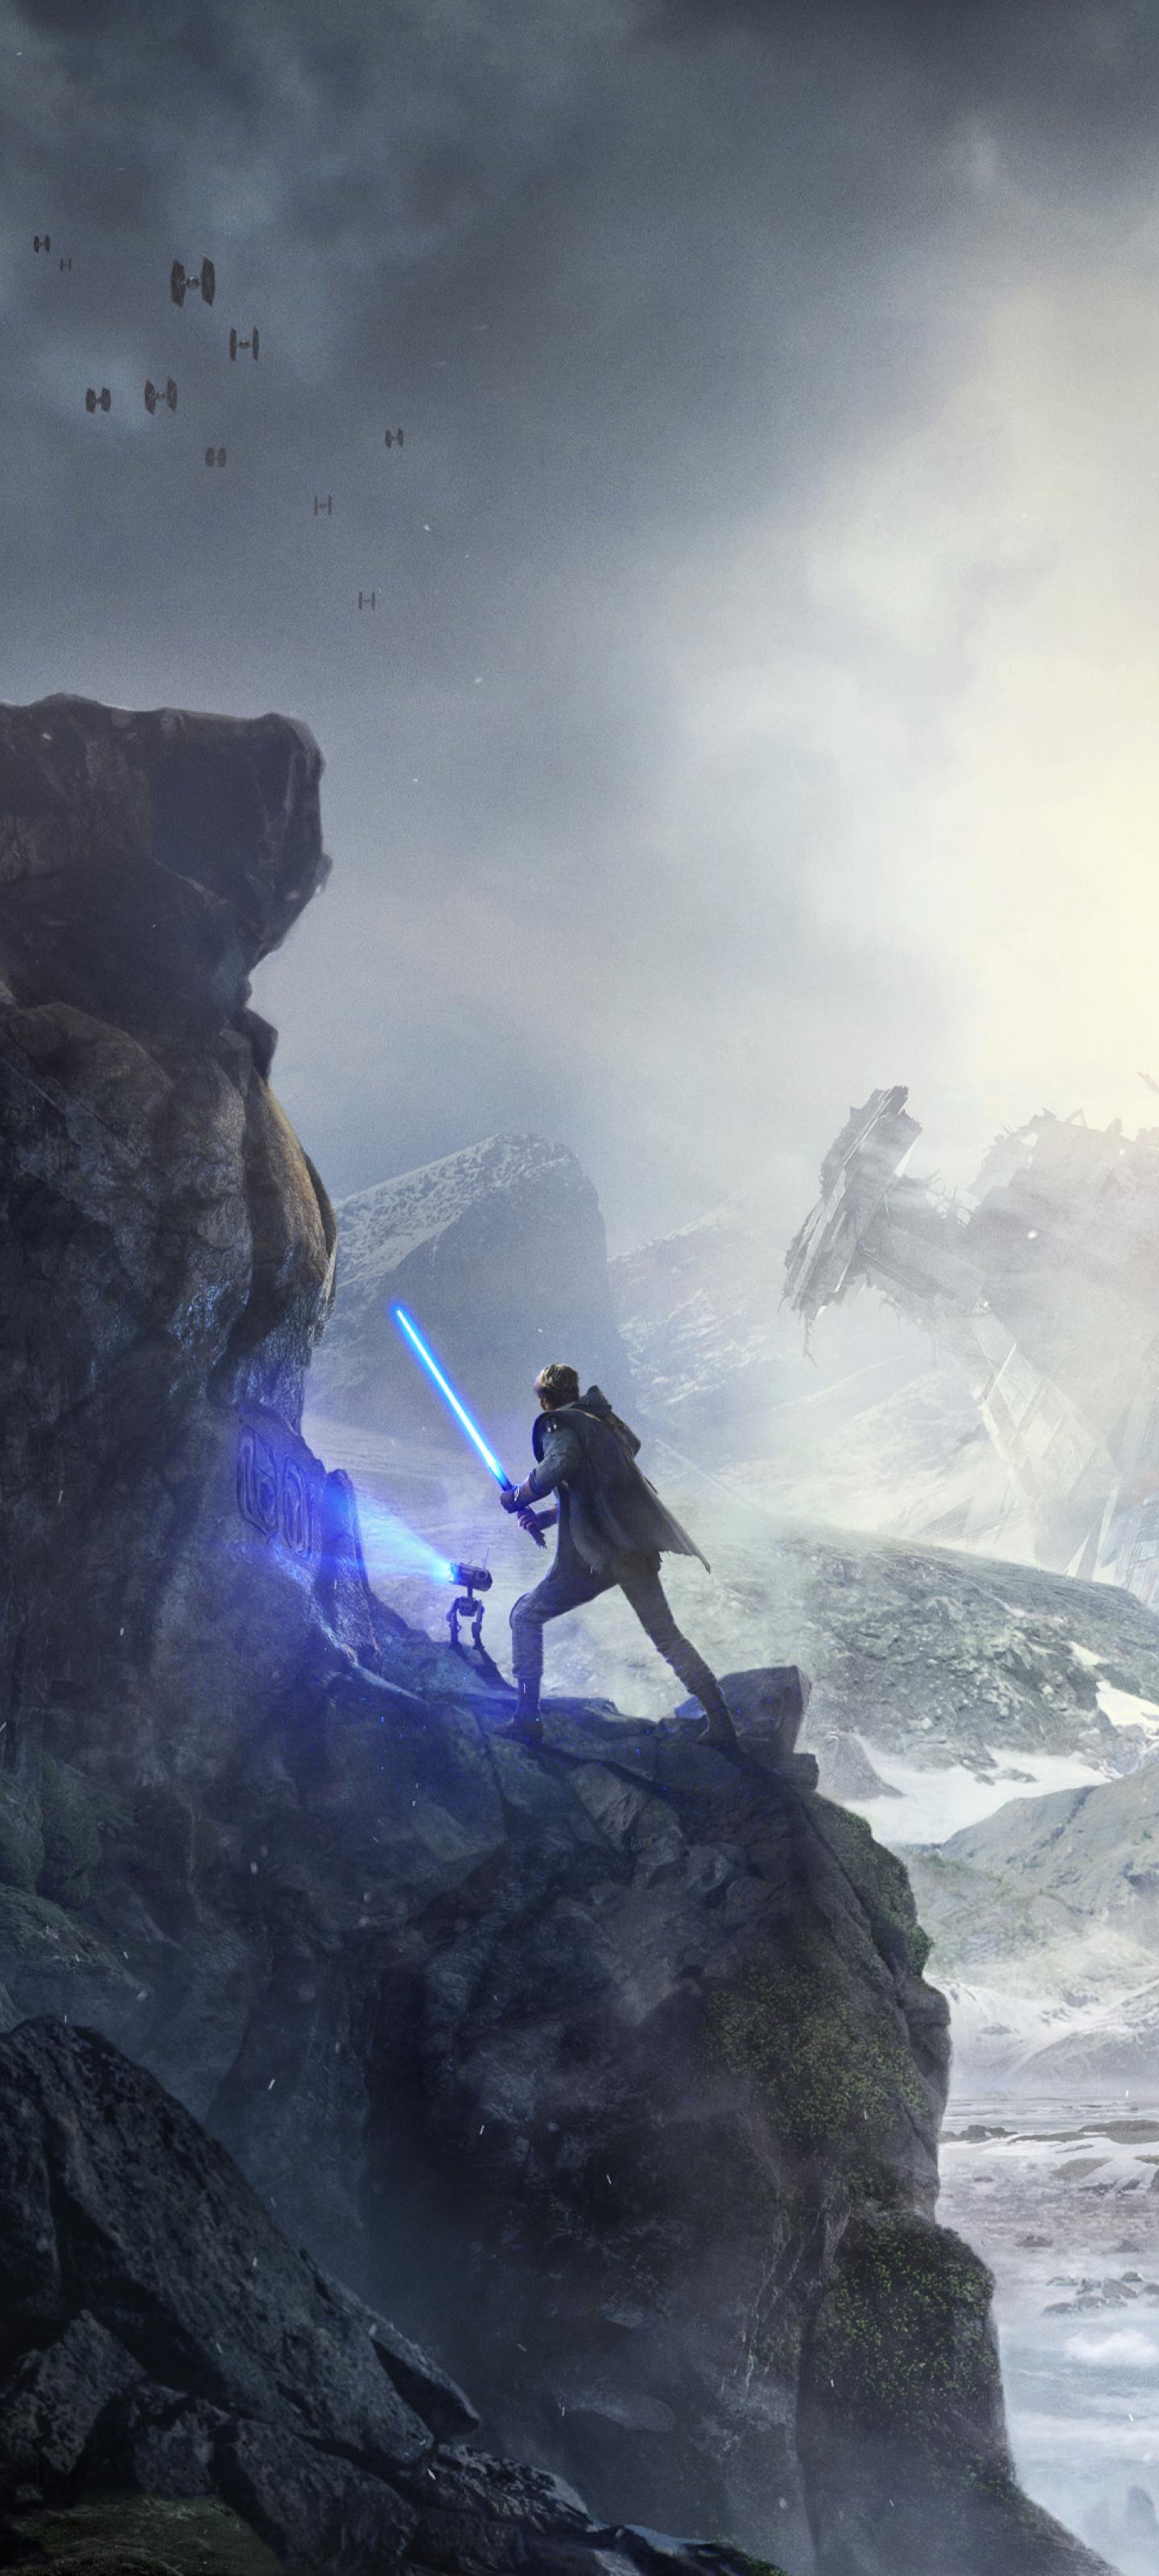 1440x3200 Star Wars Jedi Fallen Order 1440x3200 Resolution ...